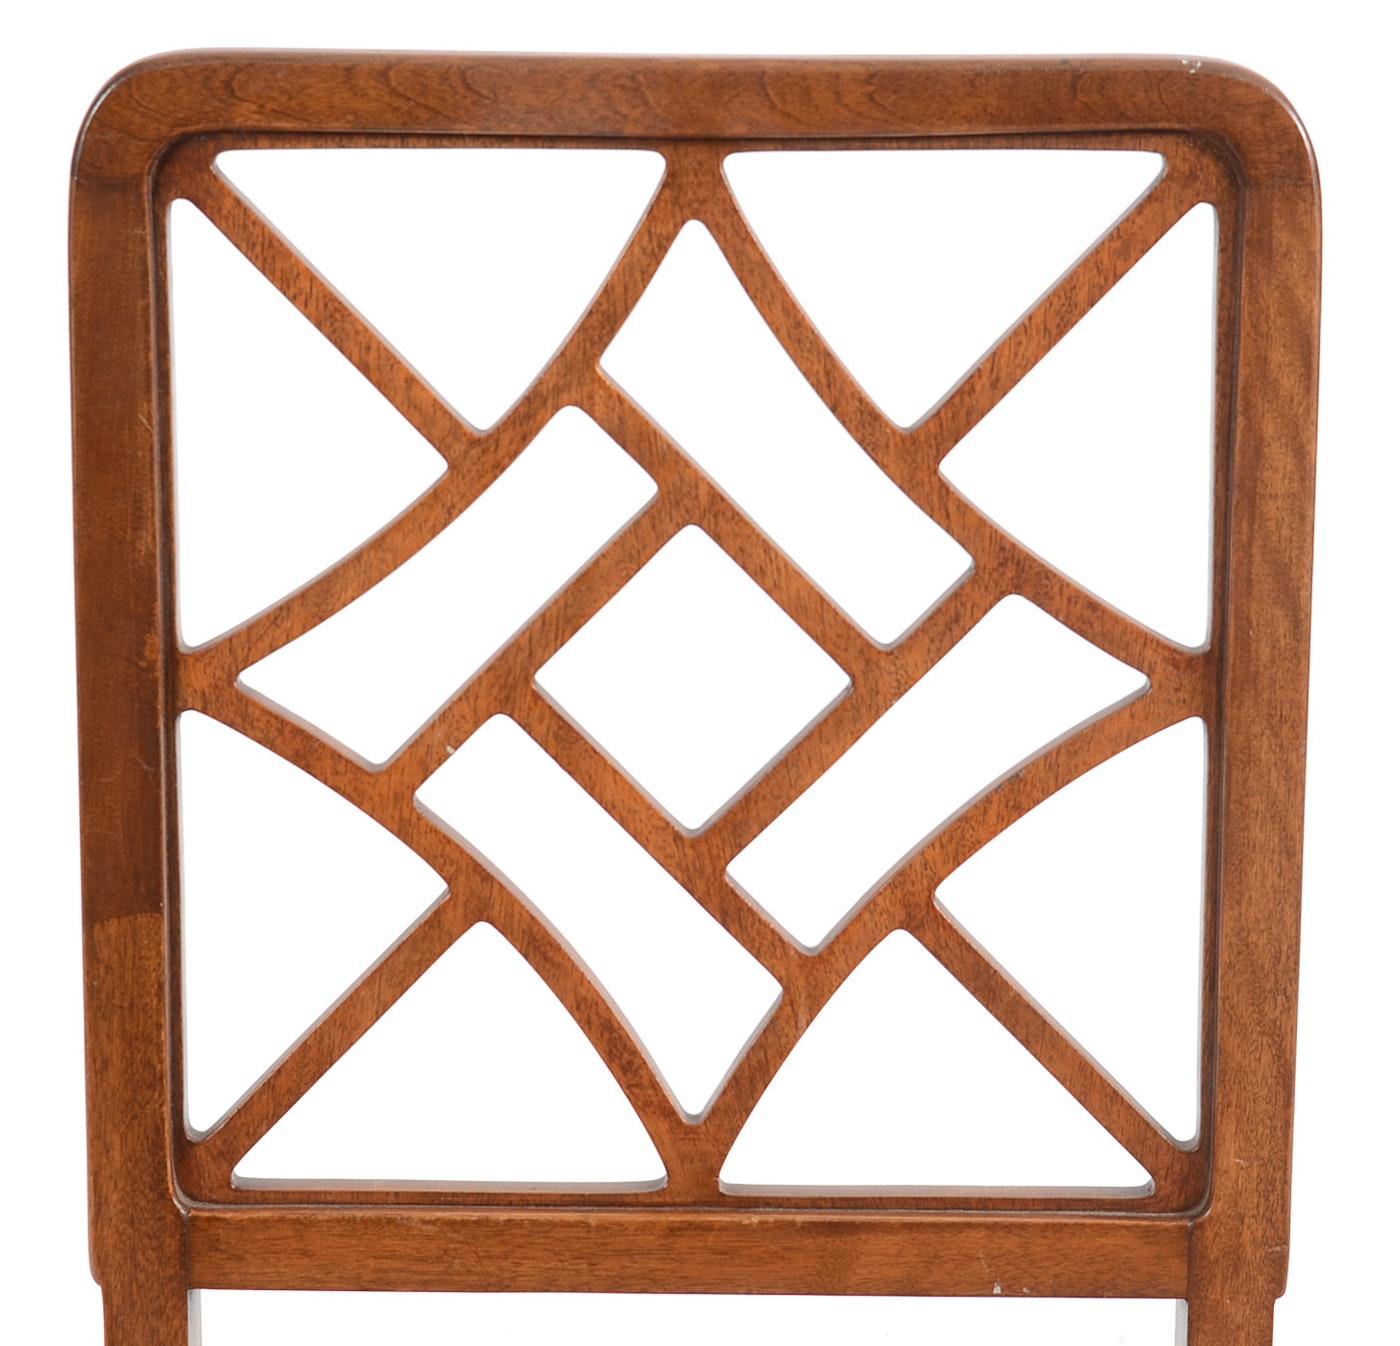 vintage art deco style side chairs ebth. Black Bedroom Furniture Sets. Home Design Ideas